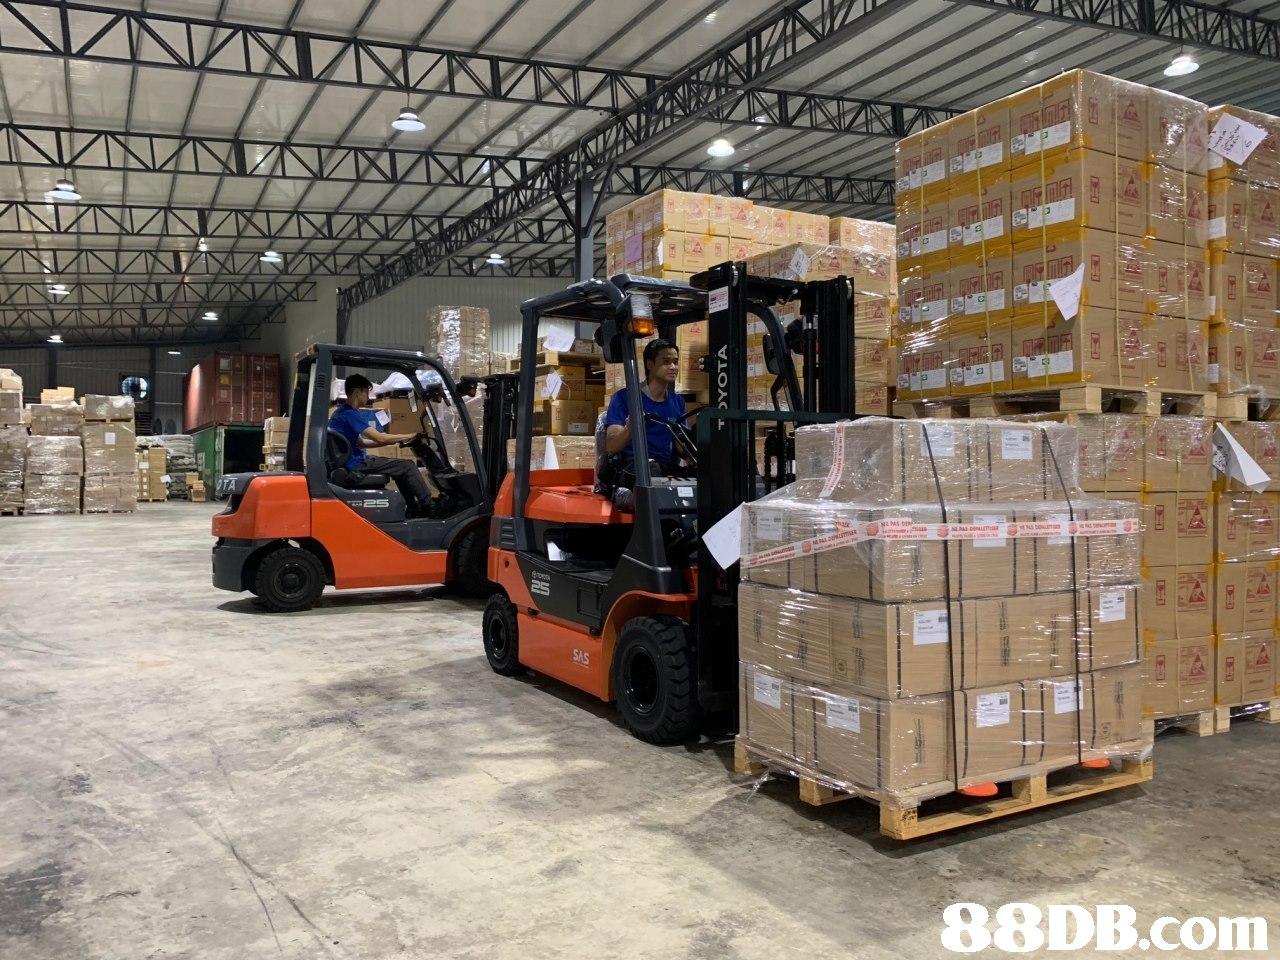 transport,forklift truck,warehouse,motor vehicle,warehouseman